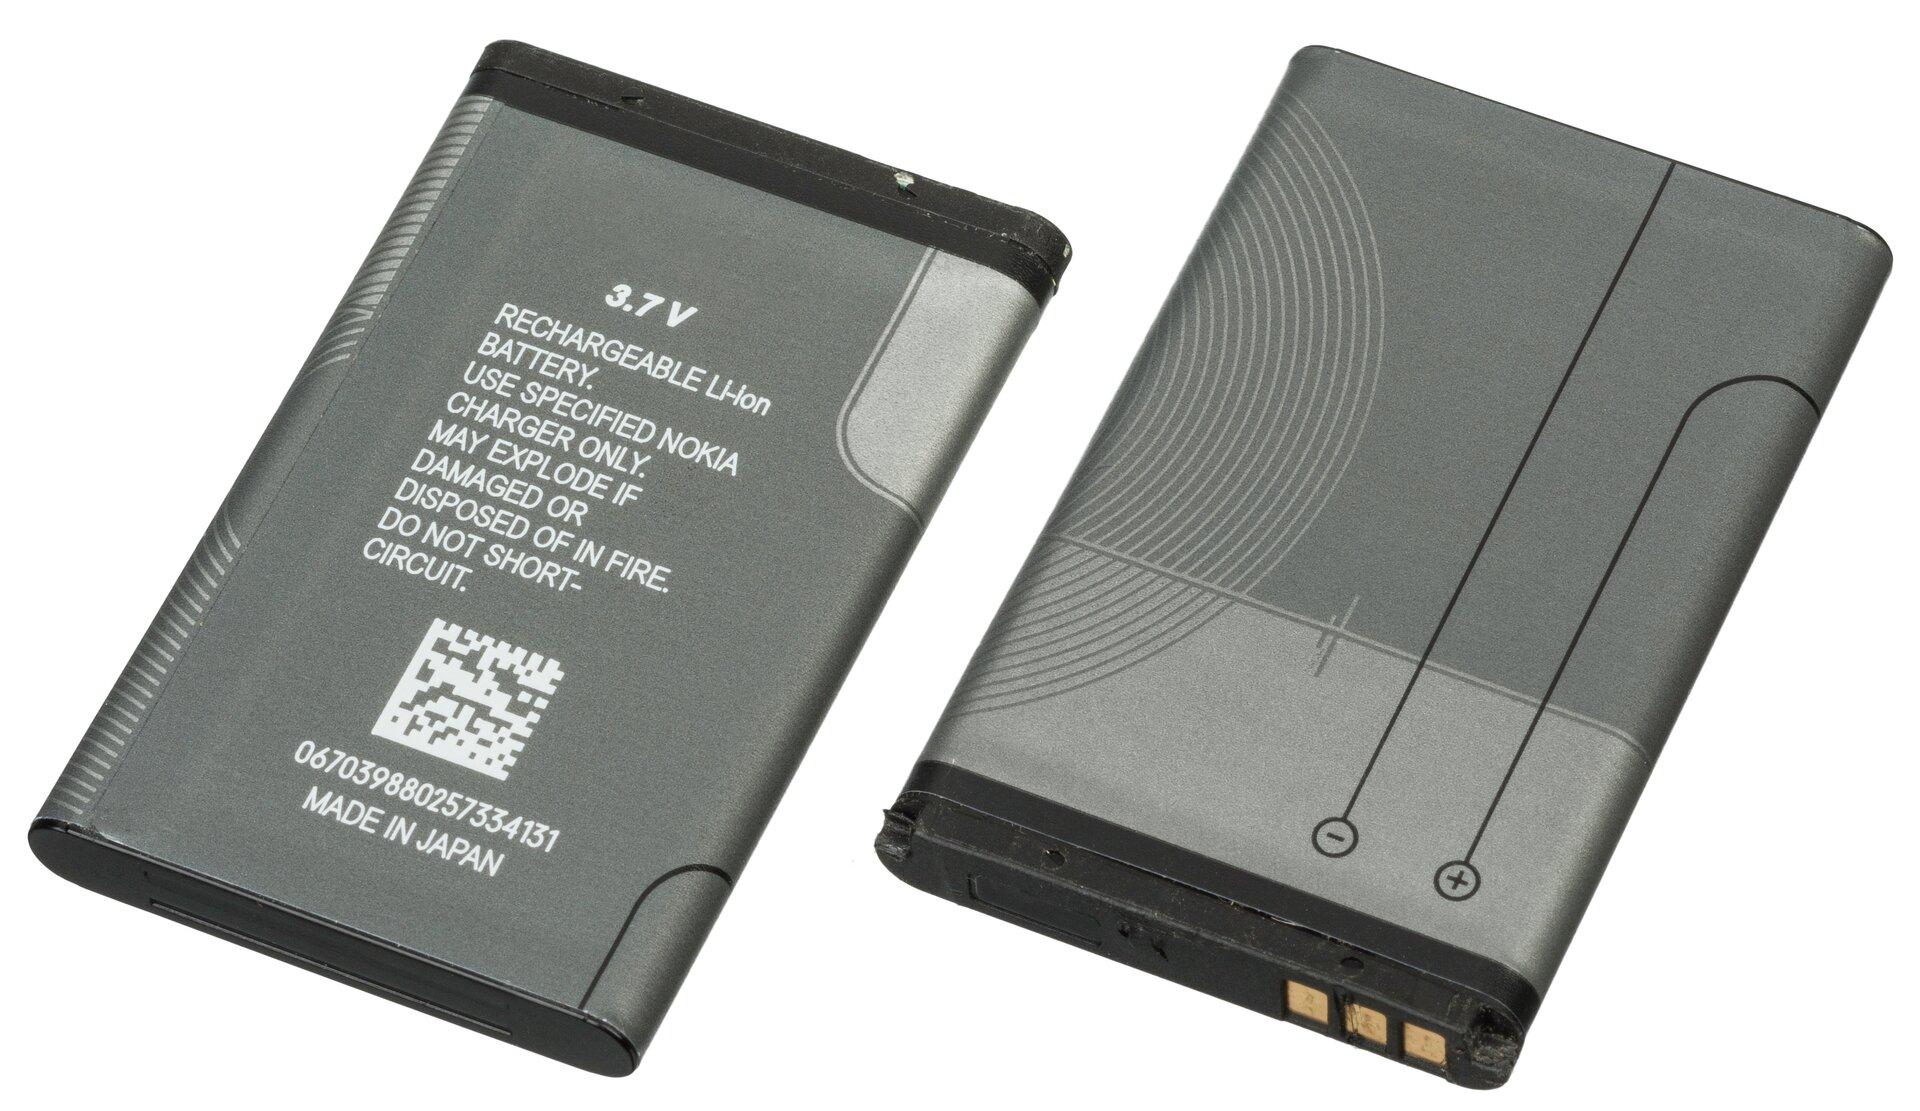 Akumulator do telefonu komórkowego onapięciu 3,7 V(widok dwustronny)